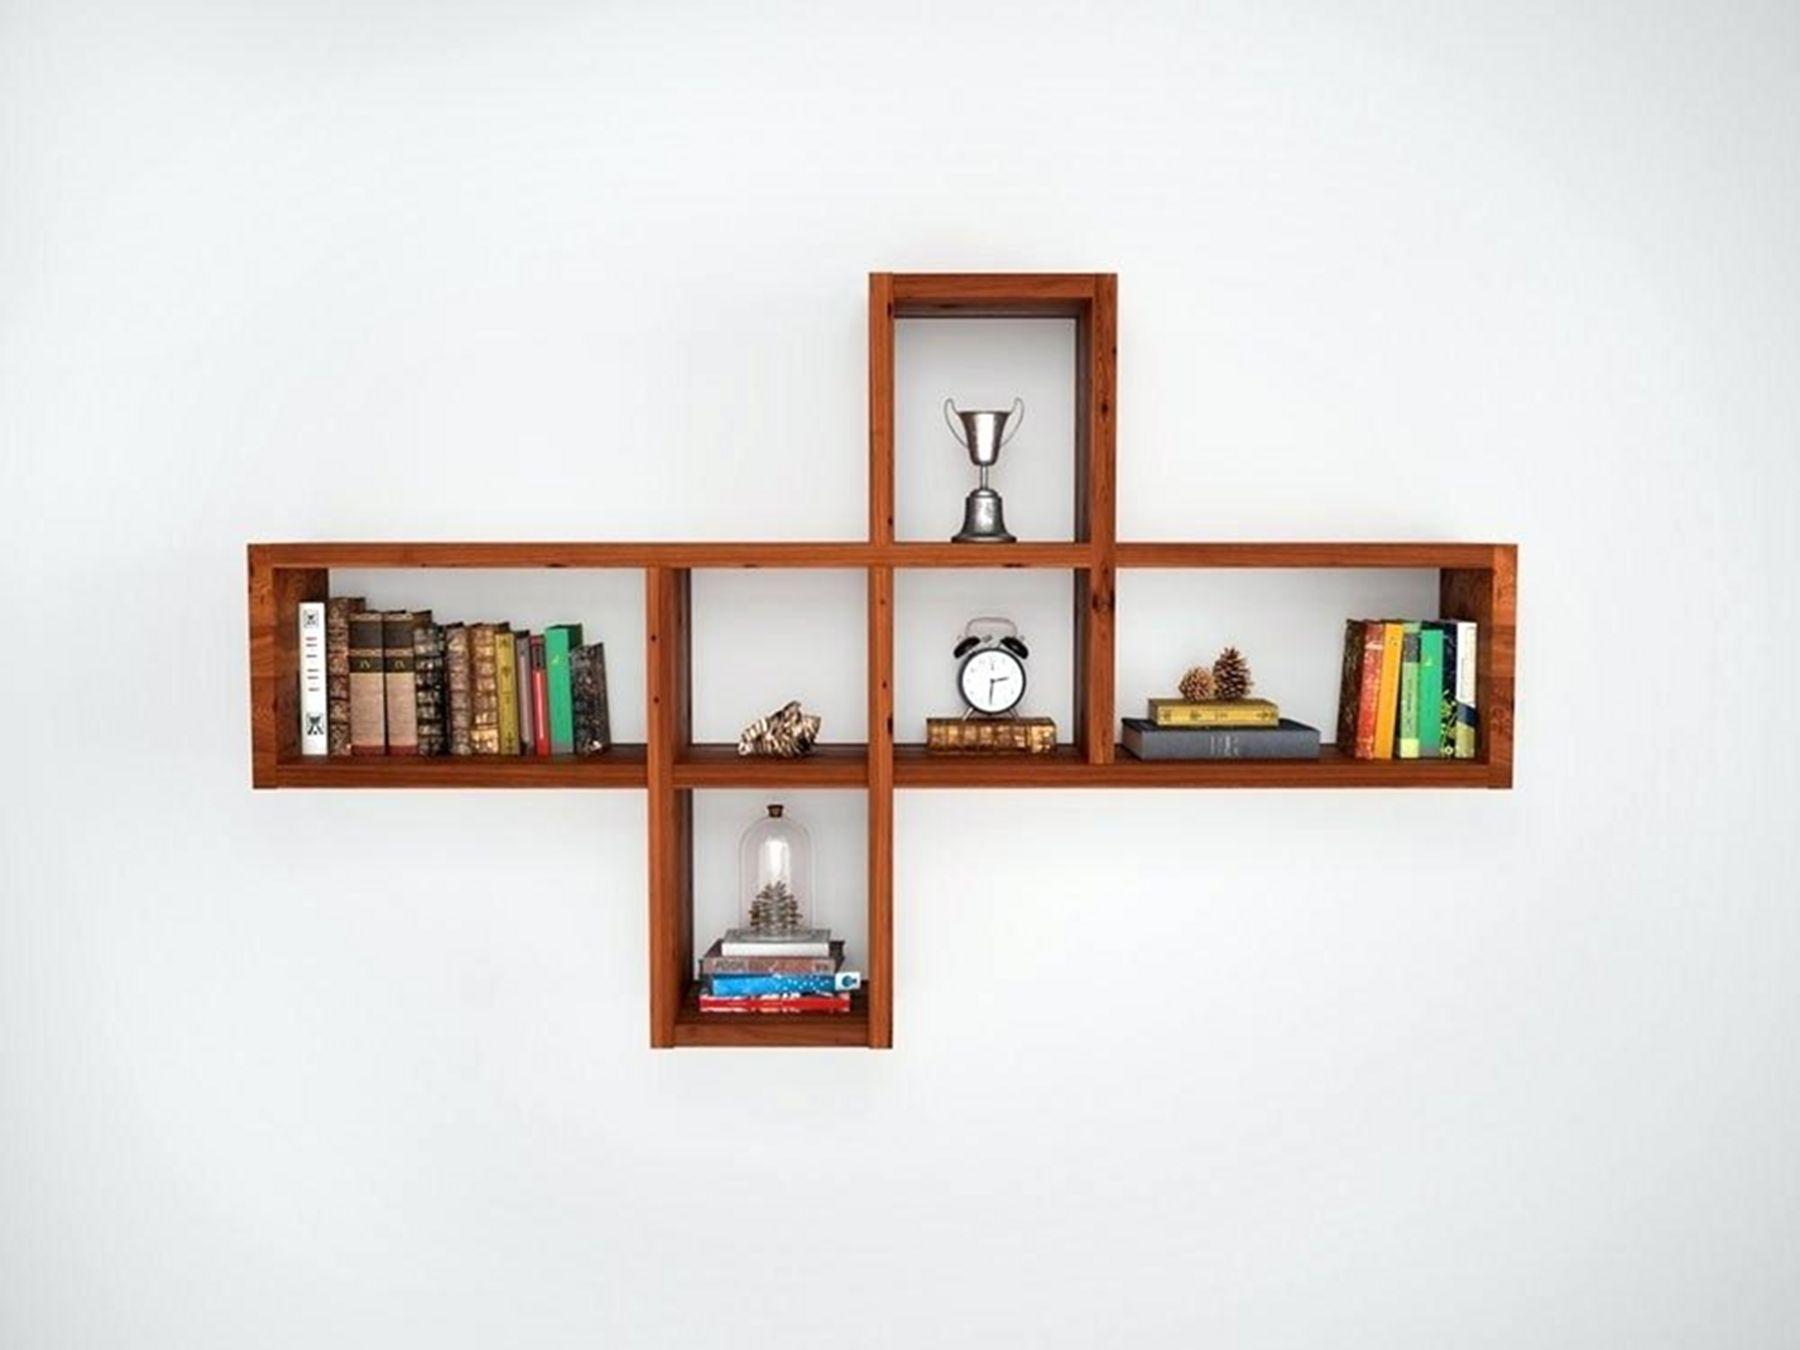 Cool Wall Shelf Design Ideas Roomy Wall Shelves Design Wooden Wall Shelves Modern Wall Shelf